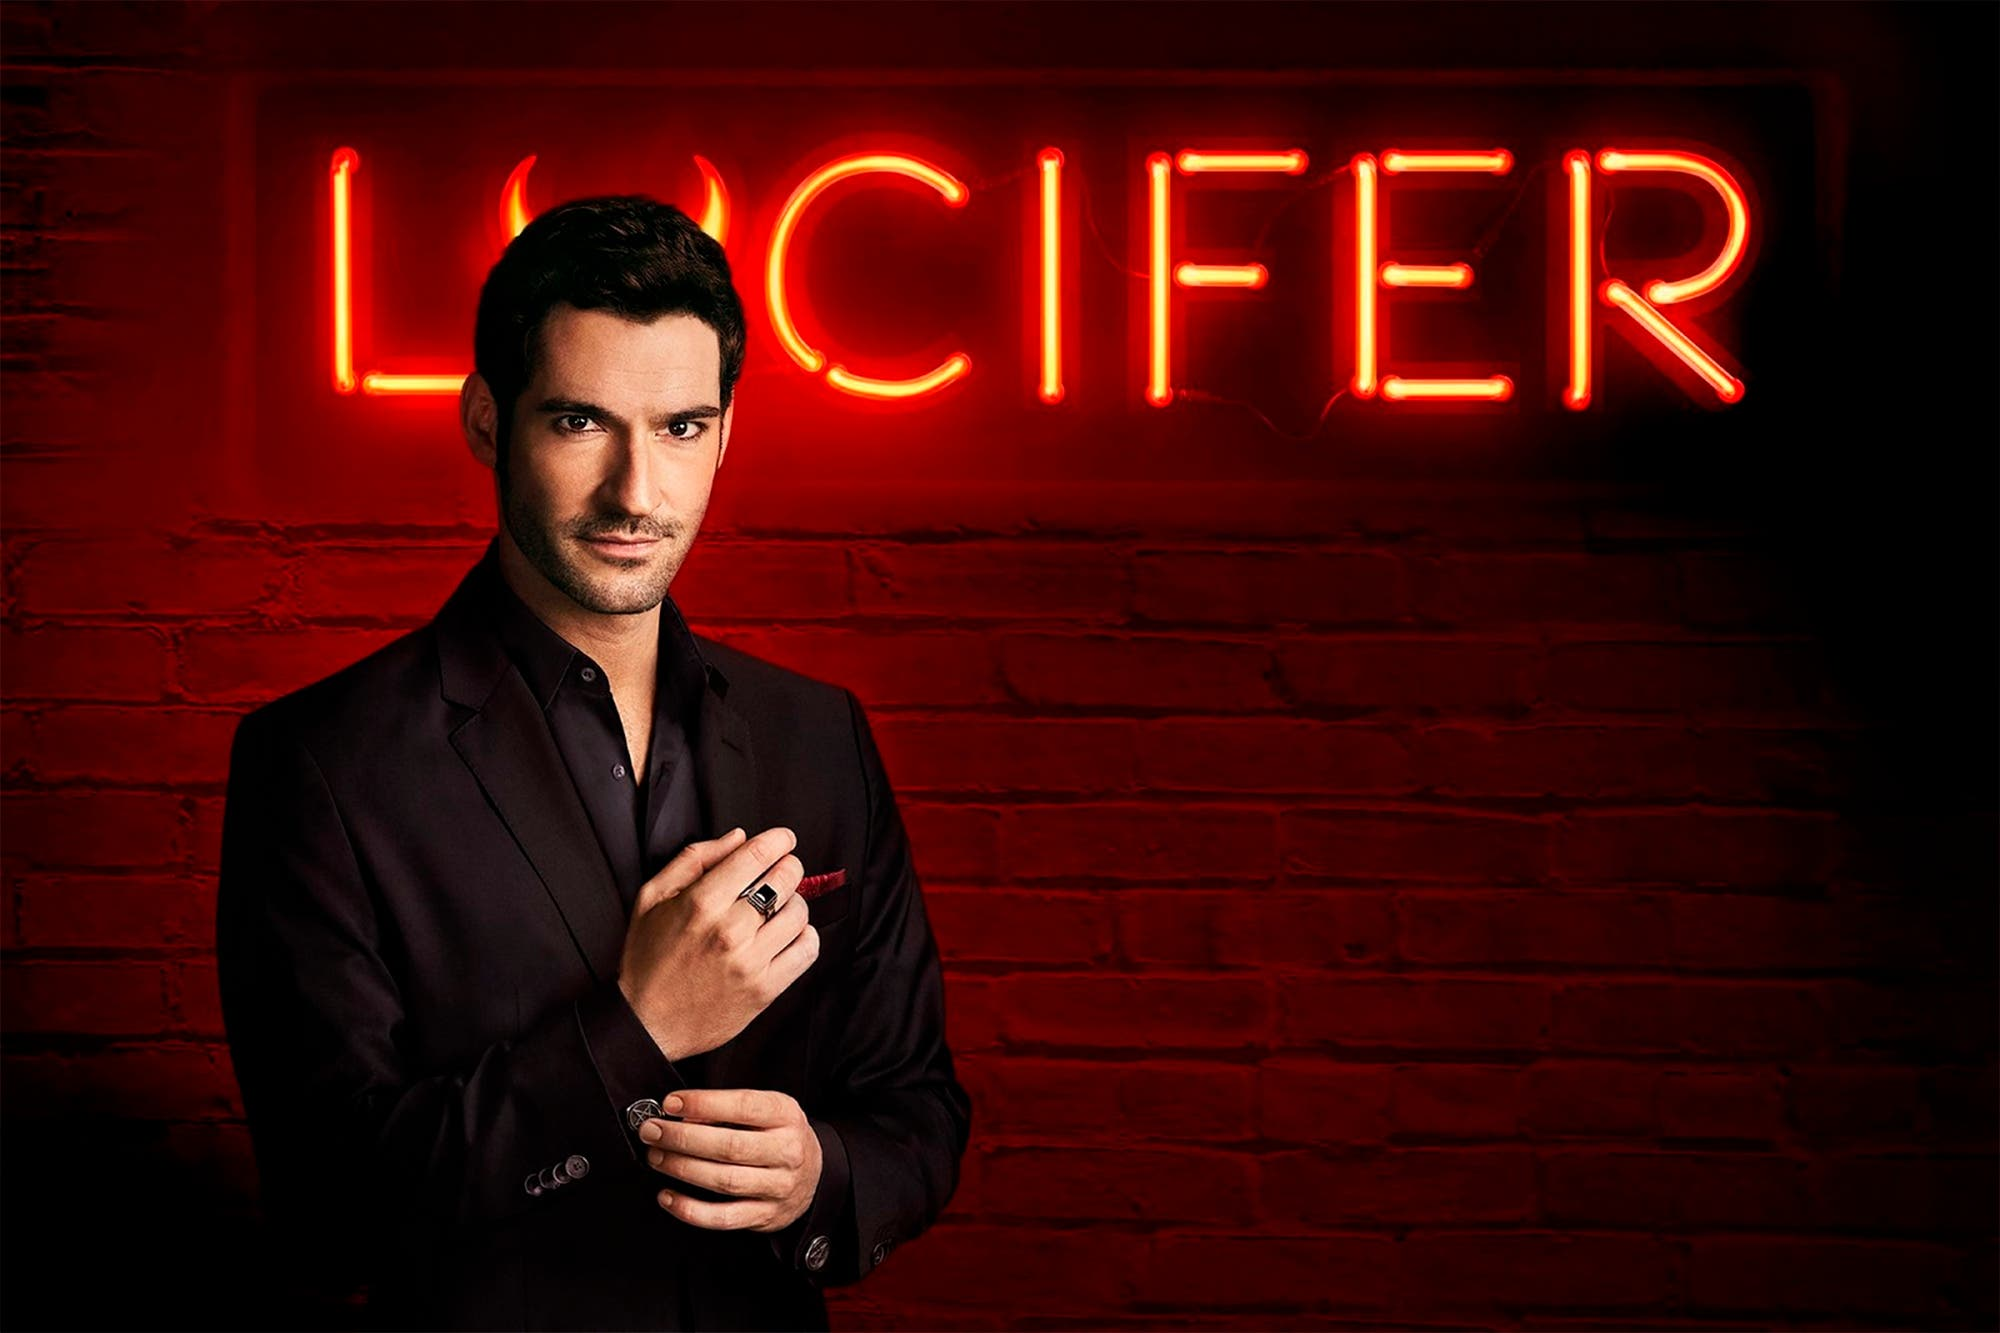 Lucifer: se filtró una imagen de un capítulo inédito que revolucionó a los fans